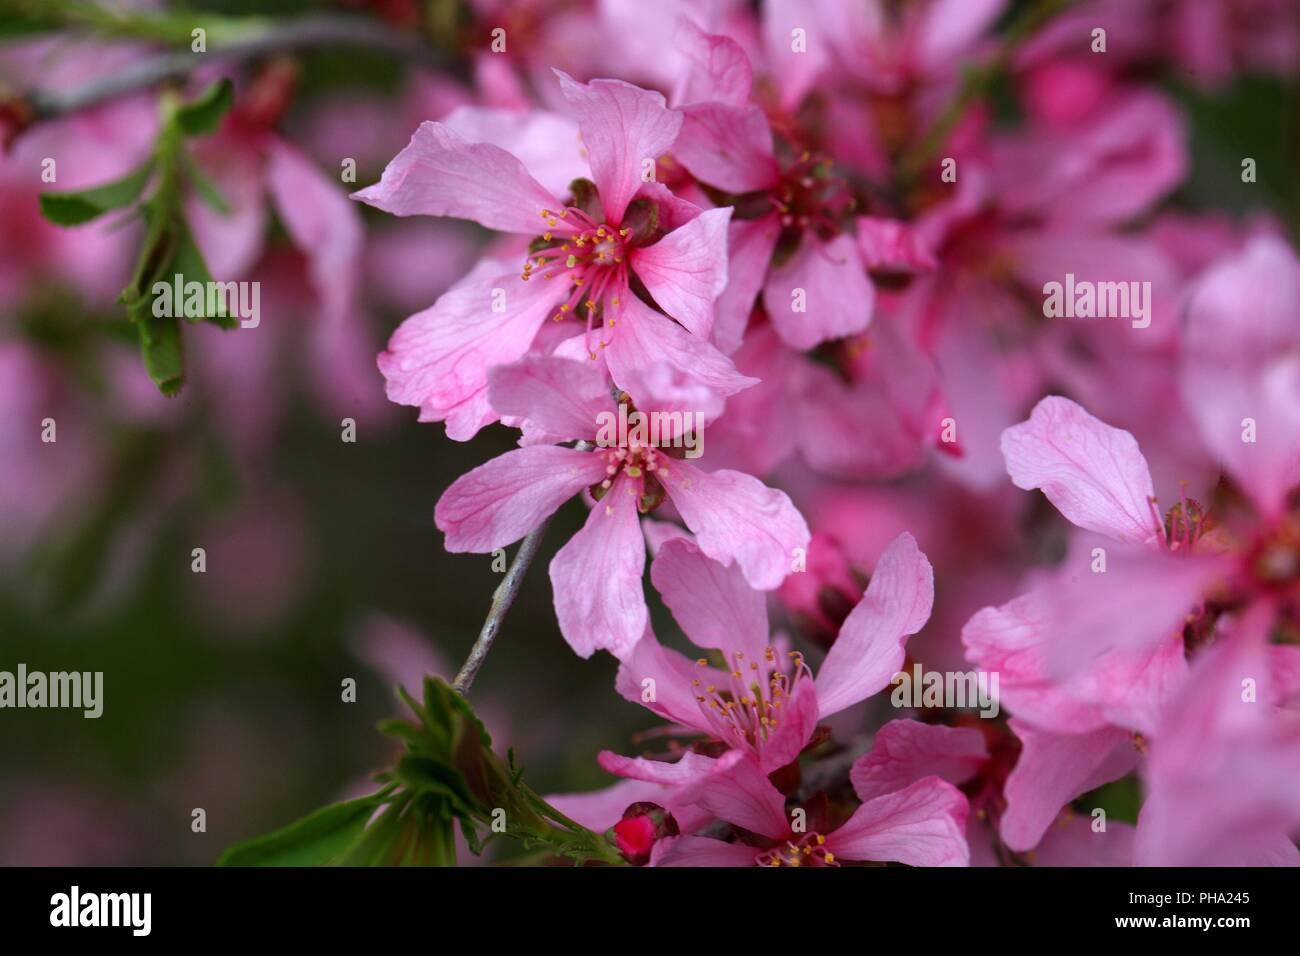 Flowers of the Russian Almond Tree (Prunus tenella). - Stock Image